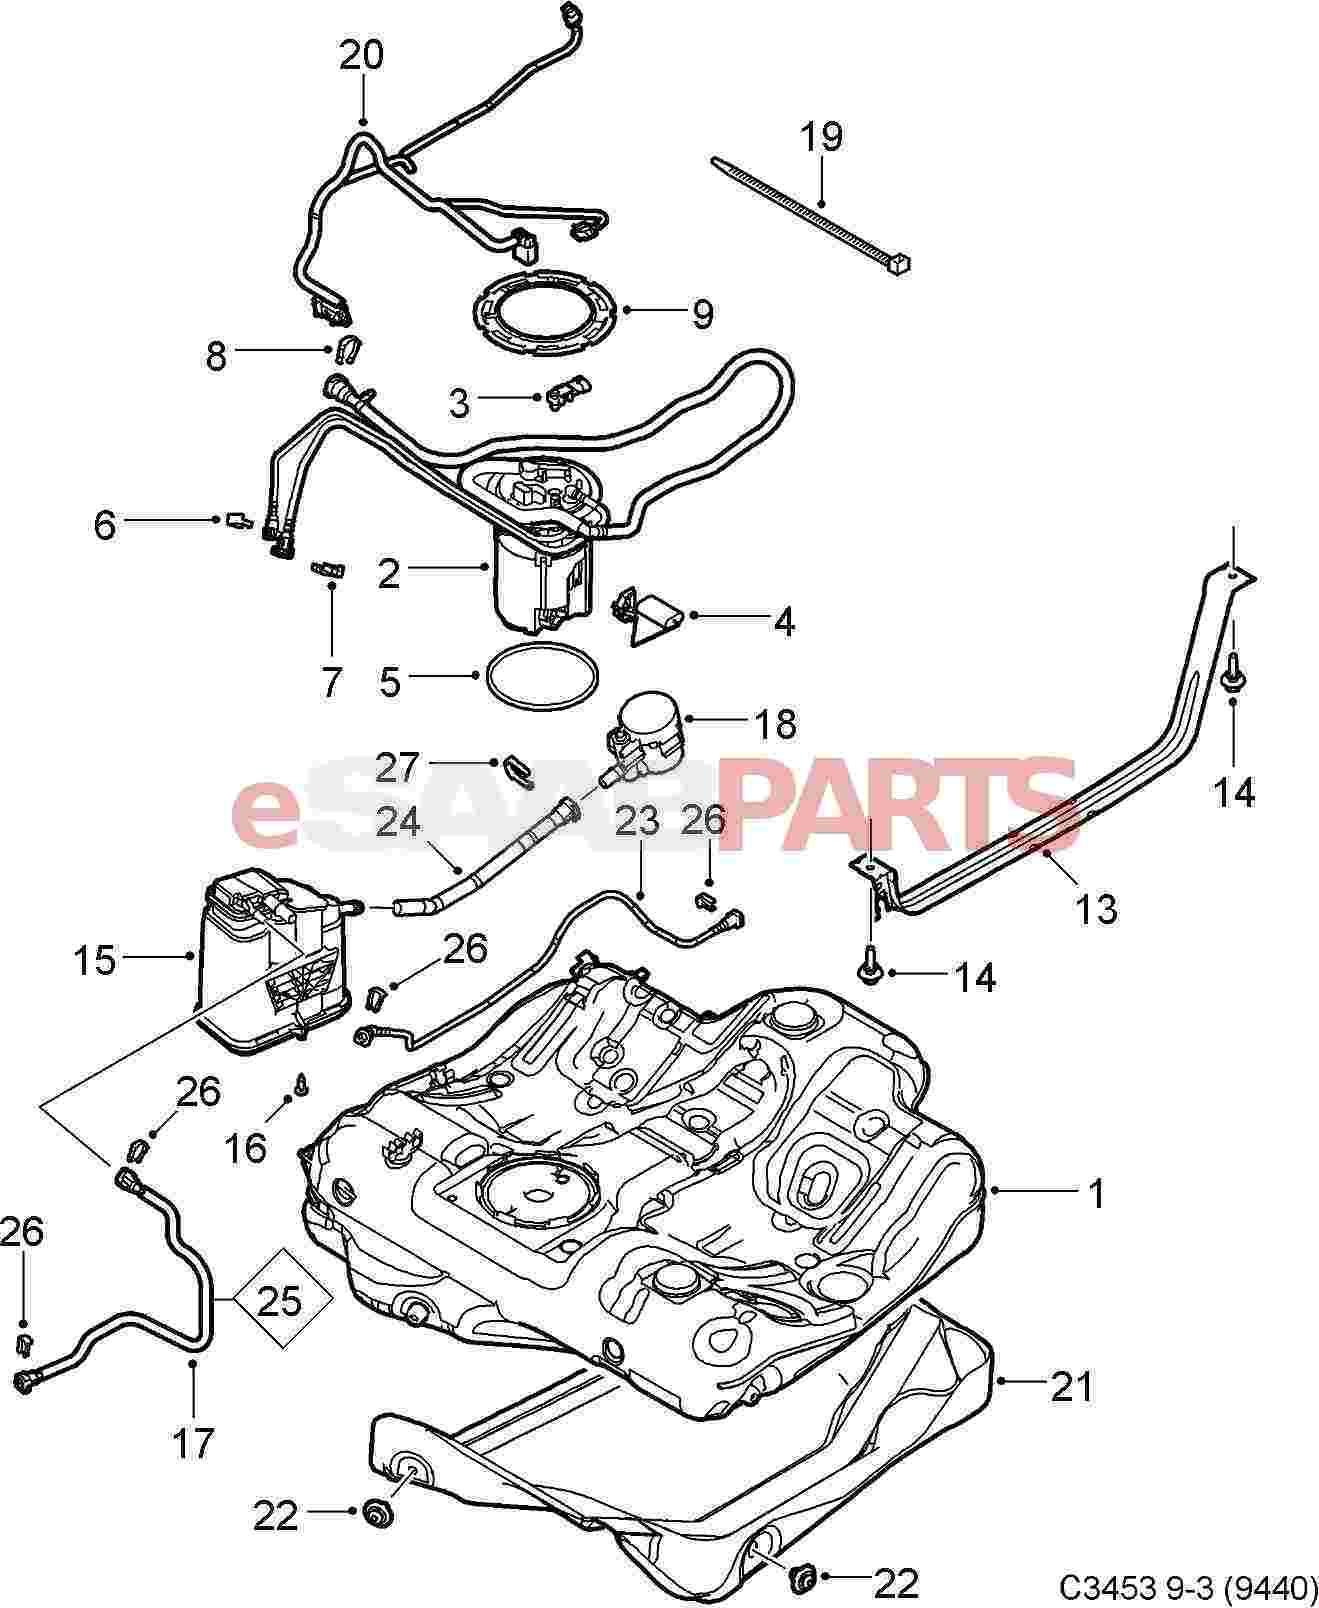 12805467 saab fuel pump 2 0t fwd genuine saab parts from rh esaabparts saab 900 fuel system diagram saab 9 3 fuel system diagram